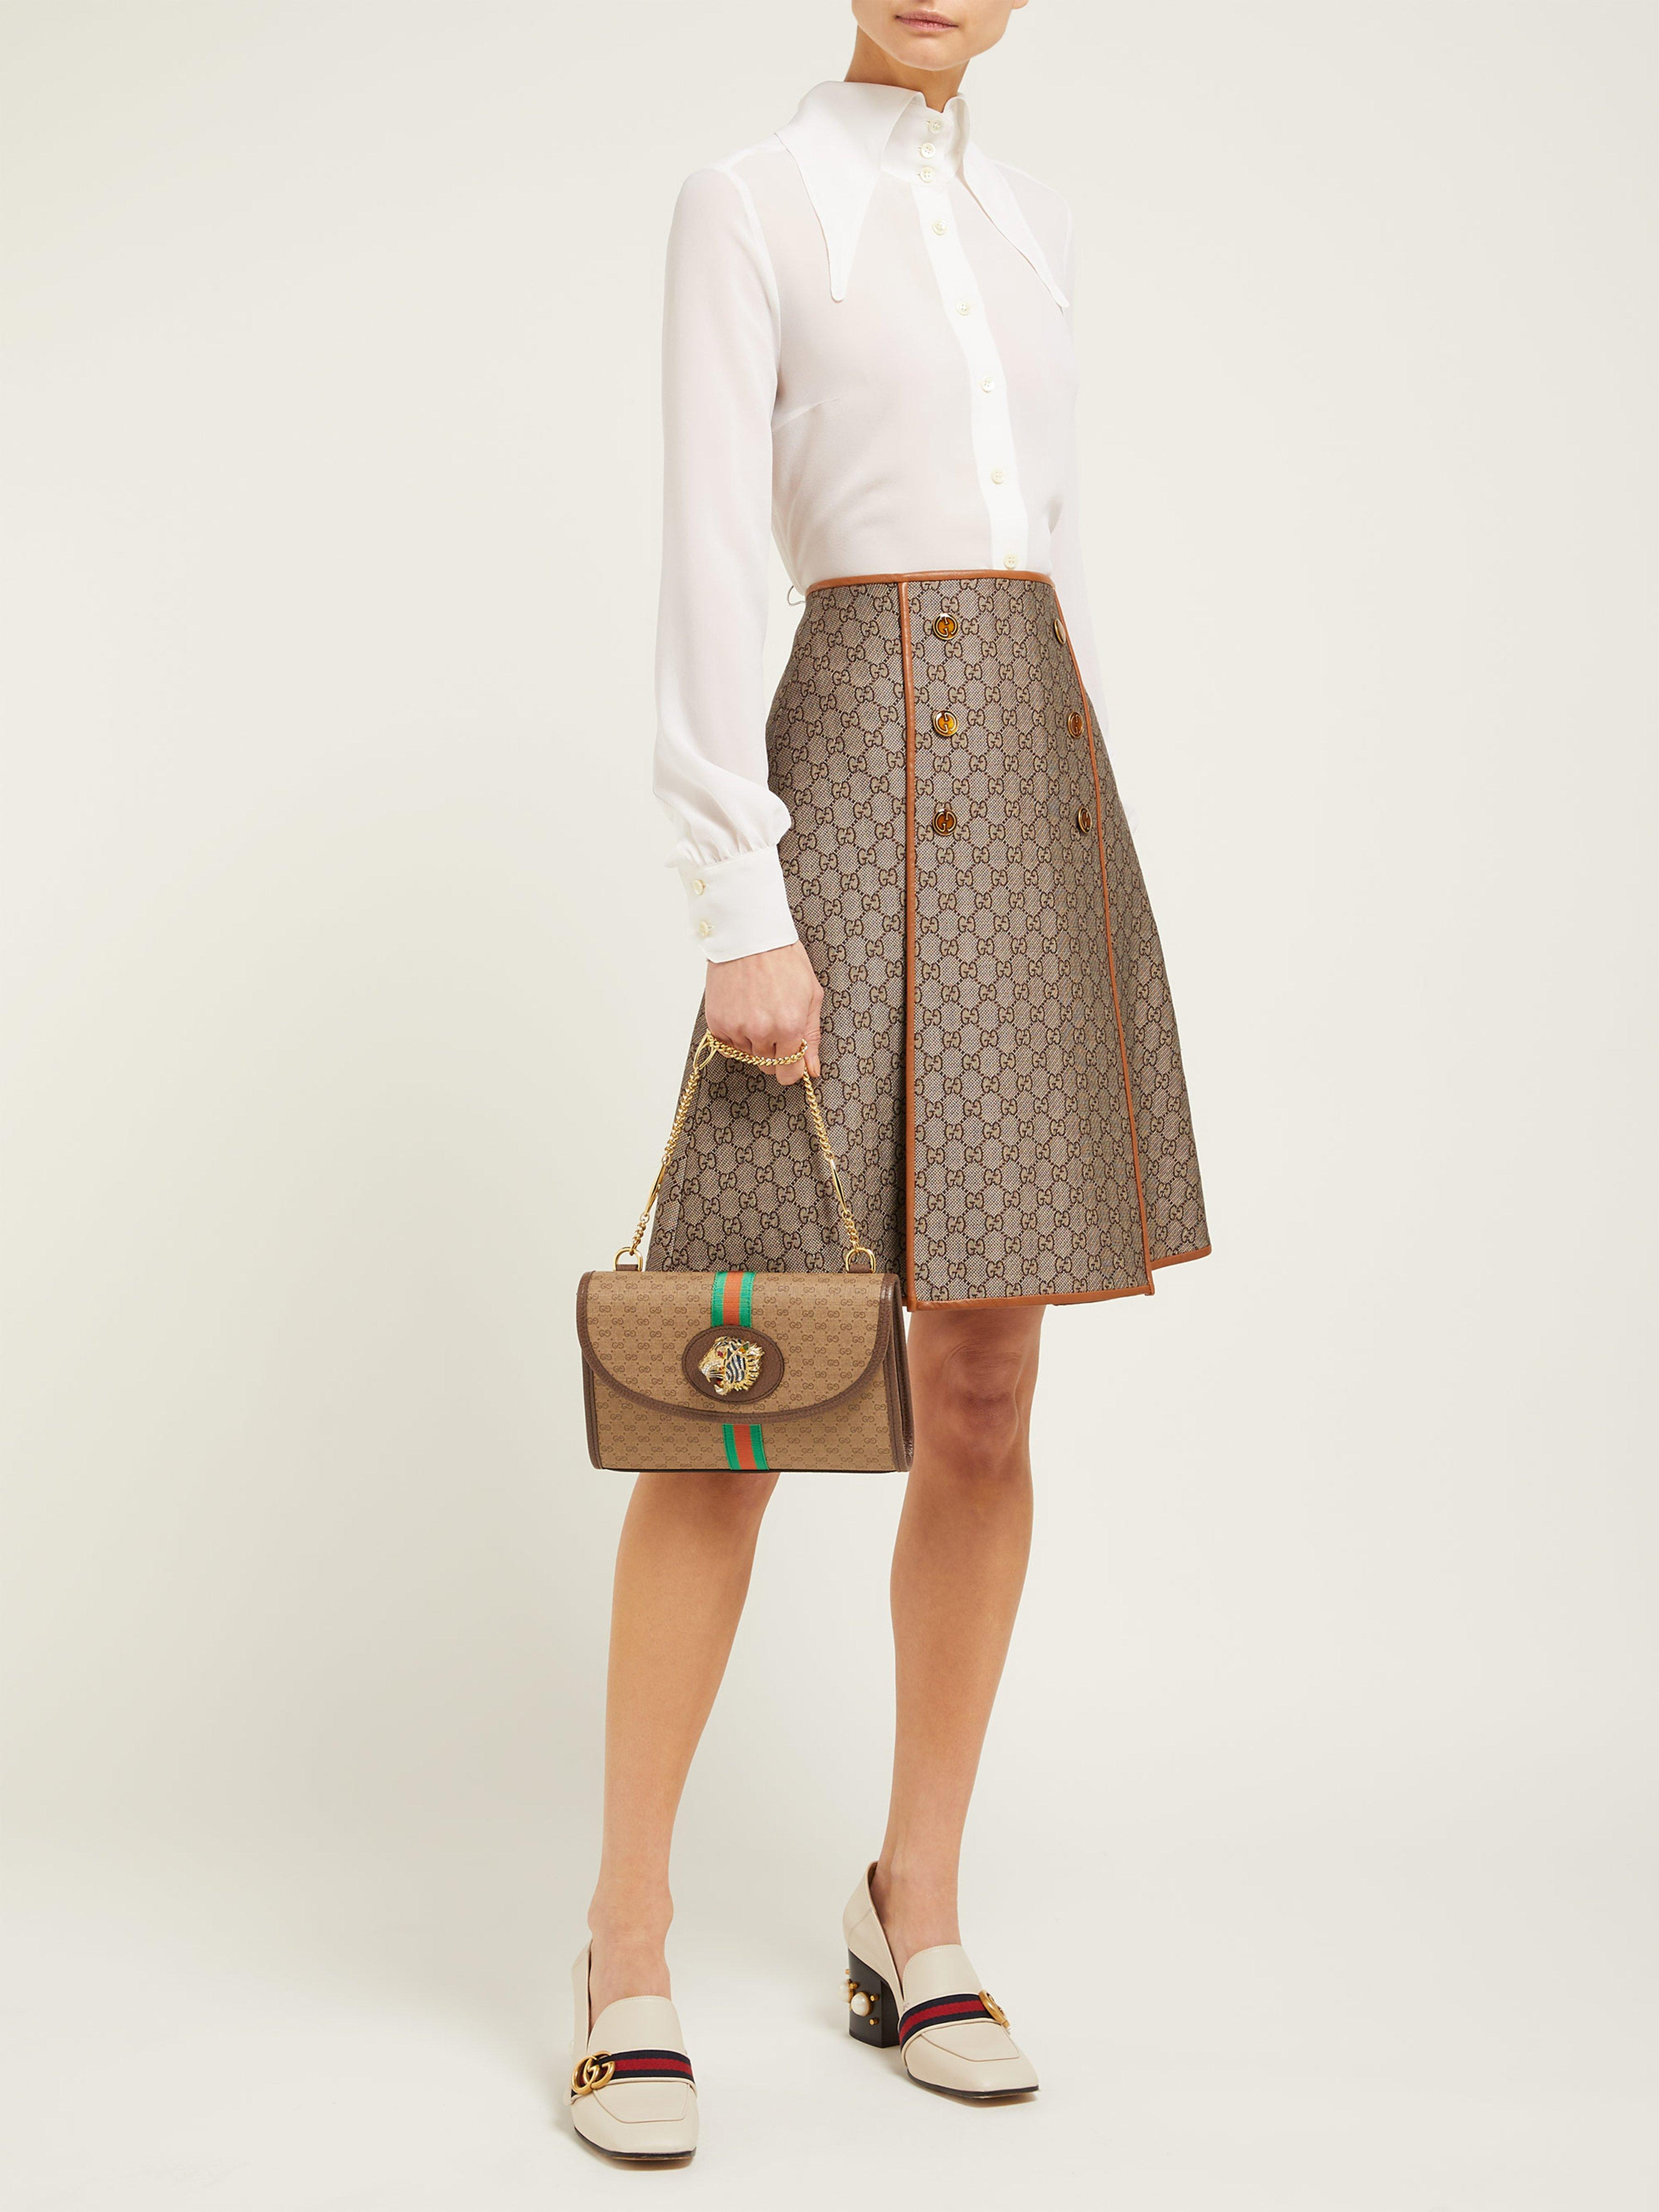 76f03083e751bd Gucci Small Rajah Gg Supreme Cross Body Bag in Natural - Lyst